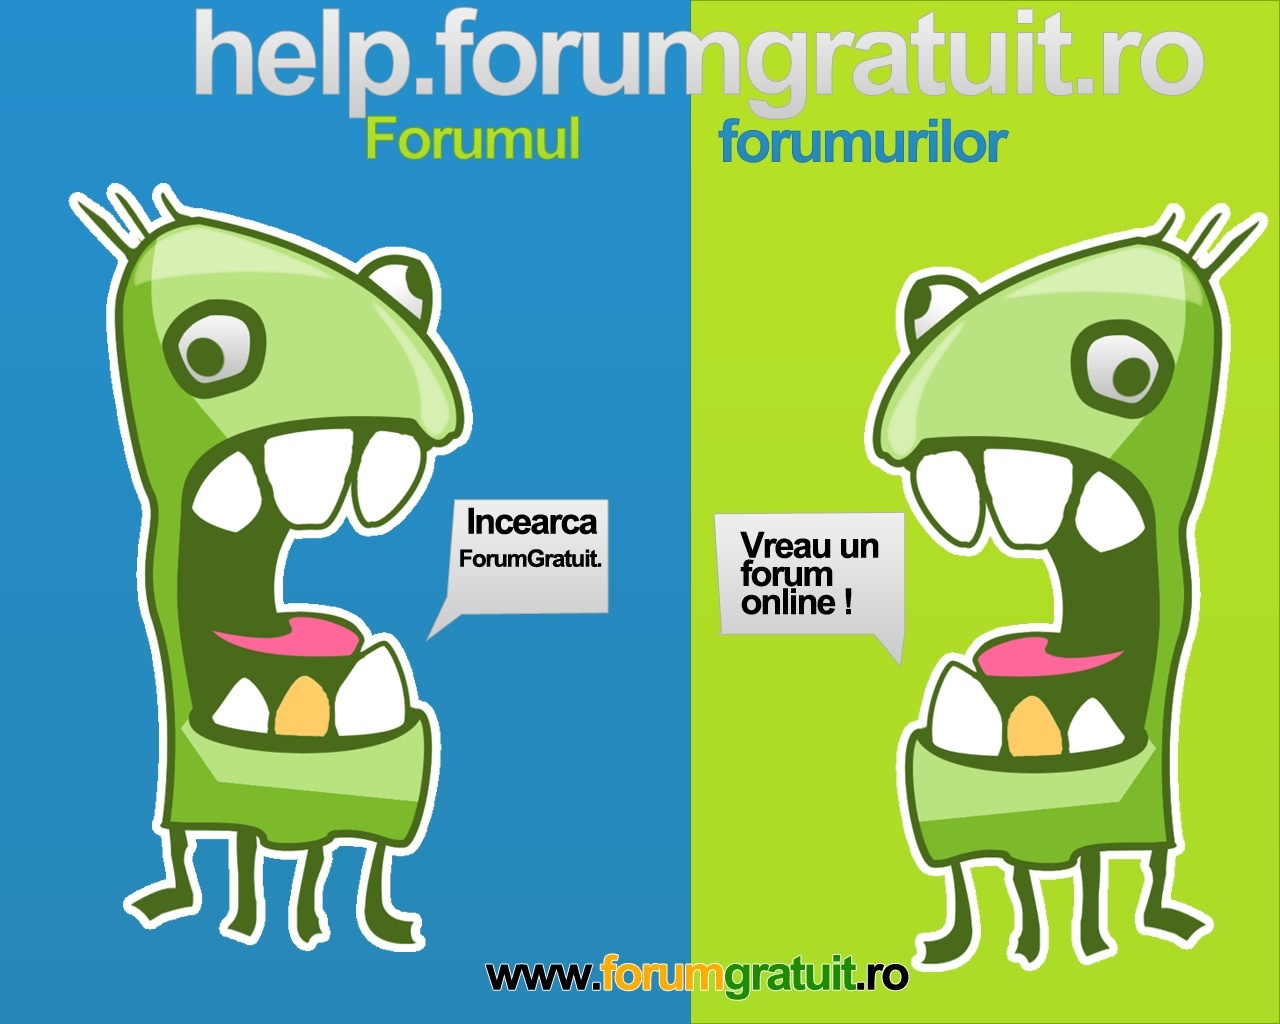 CONCURS NOU: Creeaza wallpapere ForumGratuit! - Pagina 2 1110